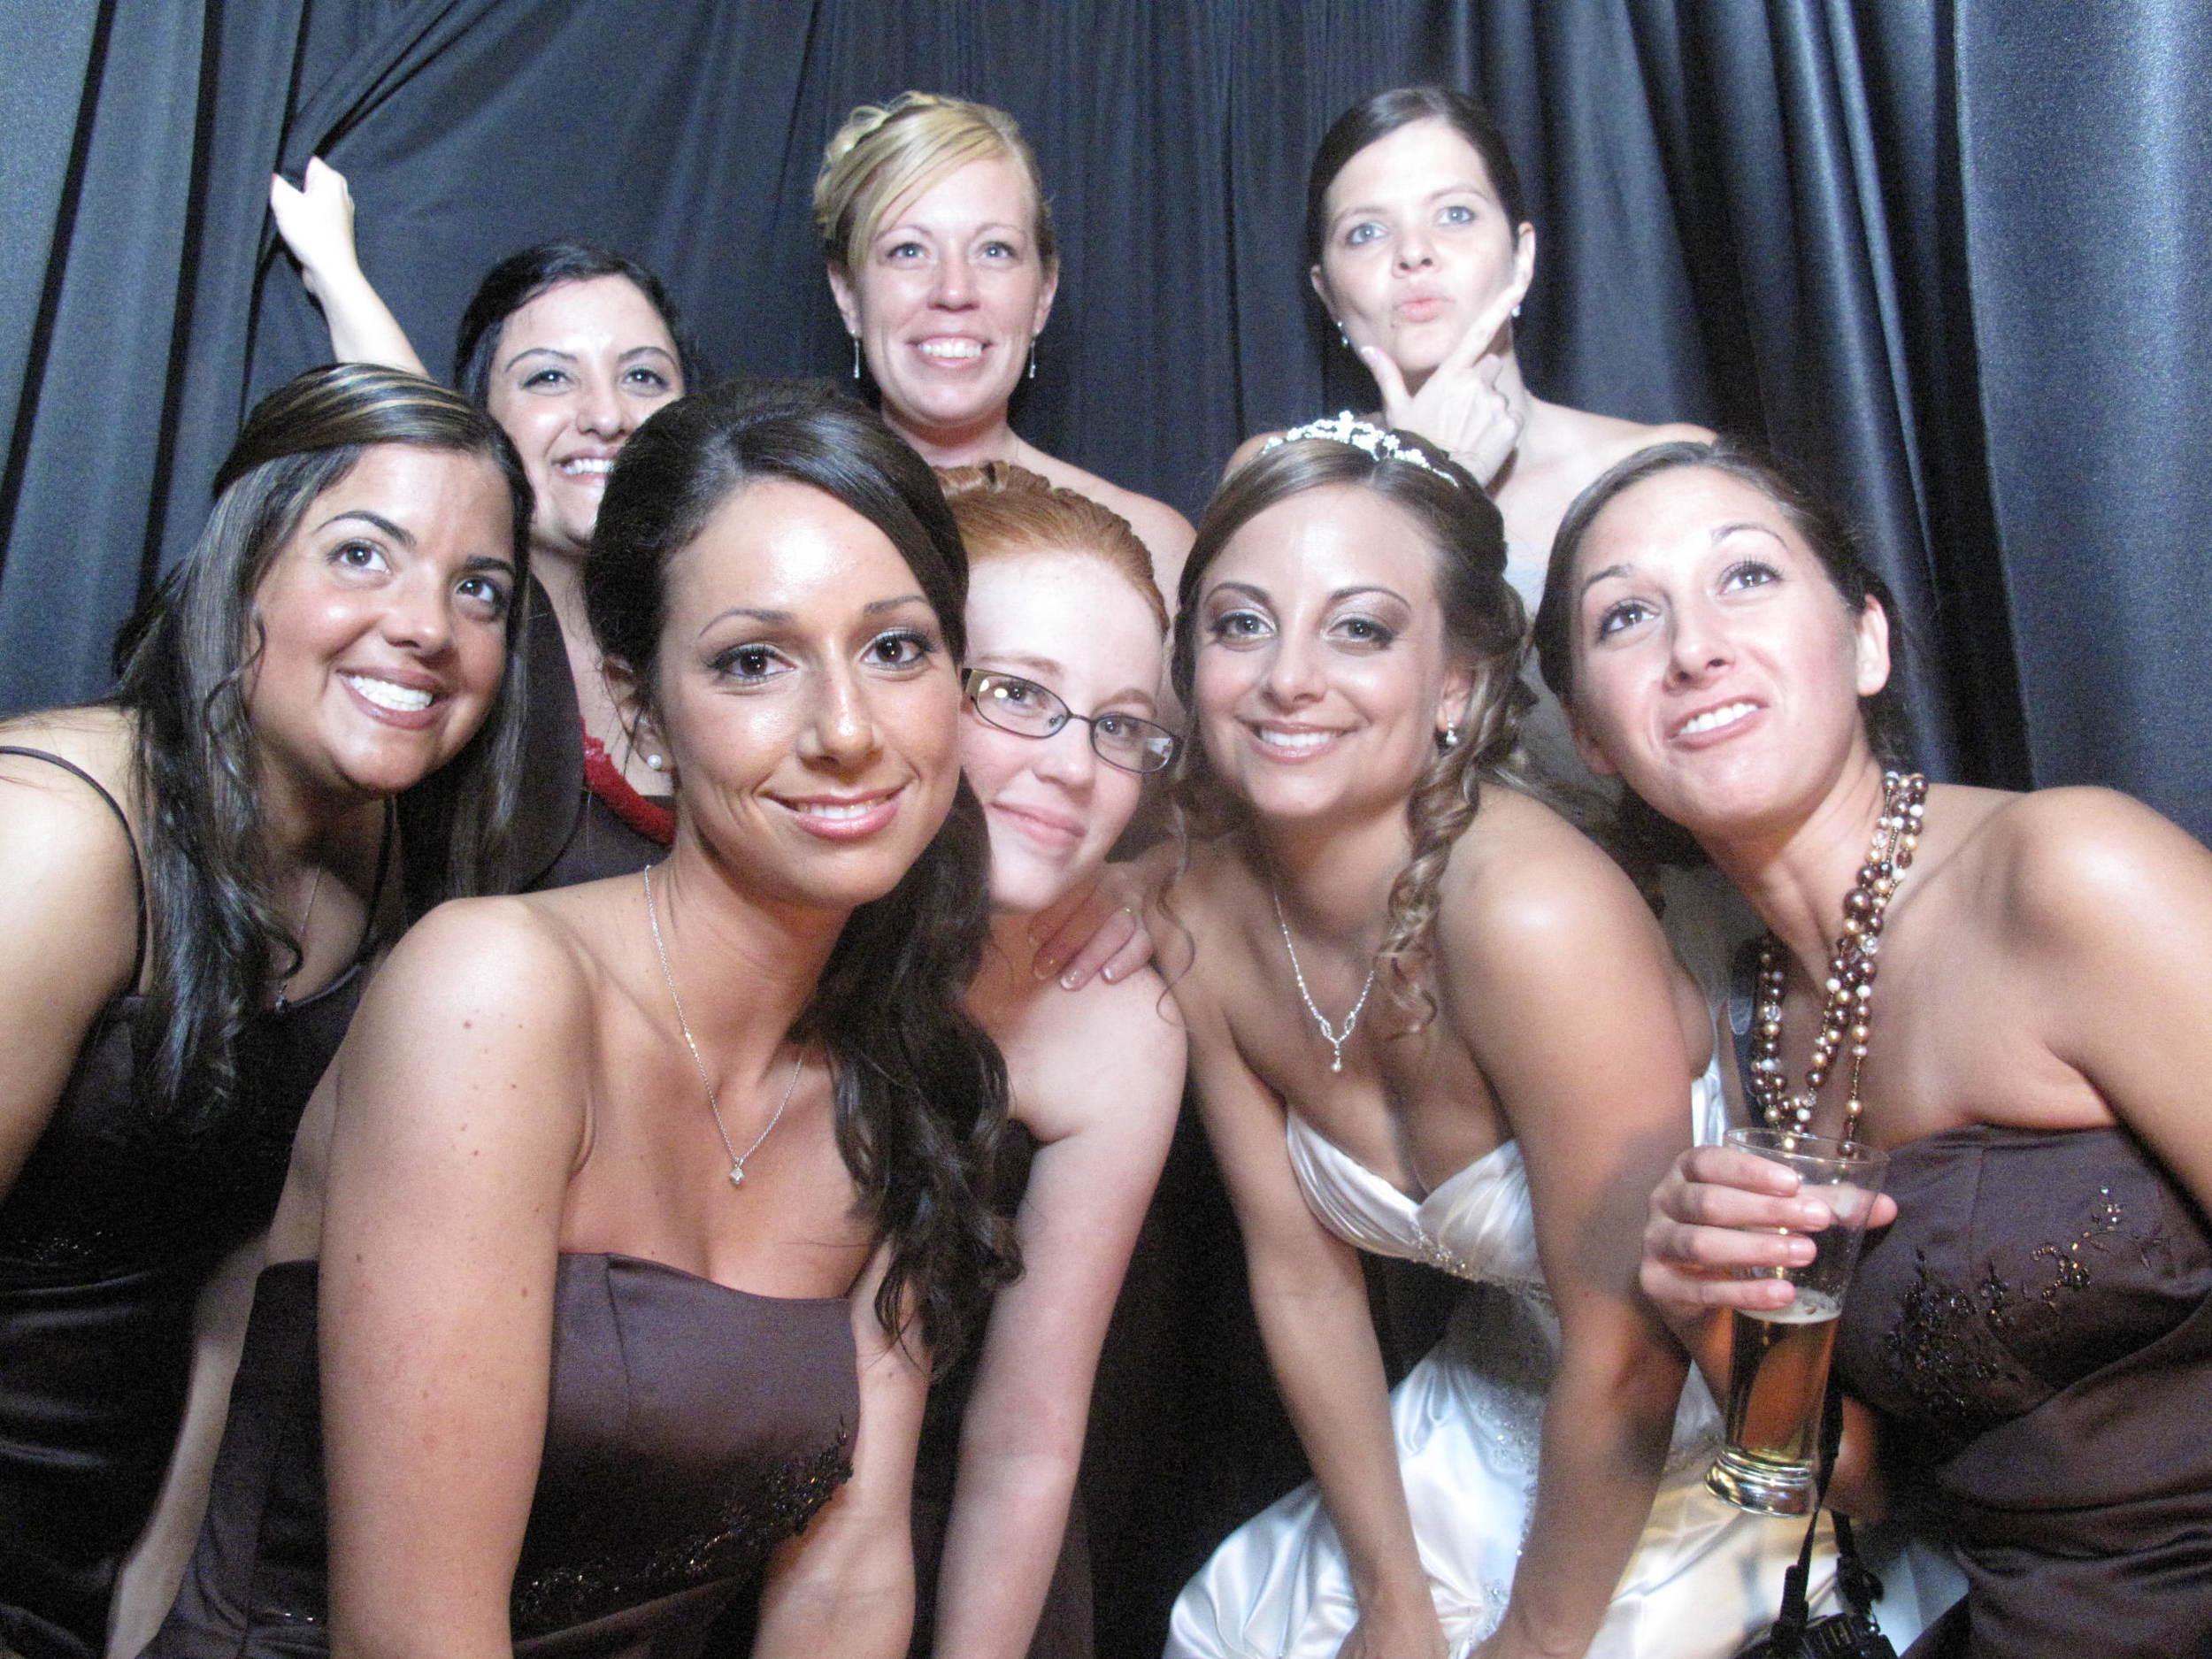 Snapshot Photobooths at the Versailles Ballroom at the Ramada Inn in Toms River